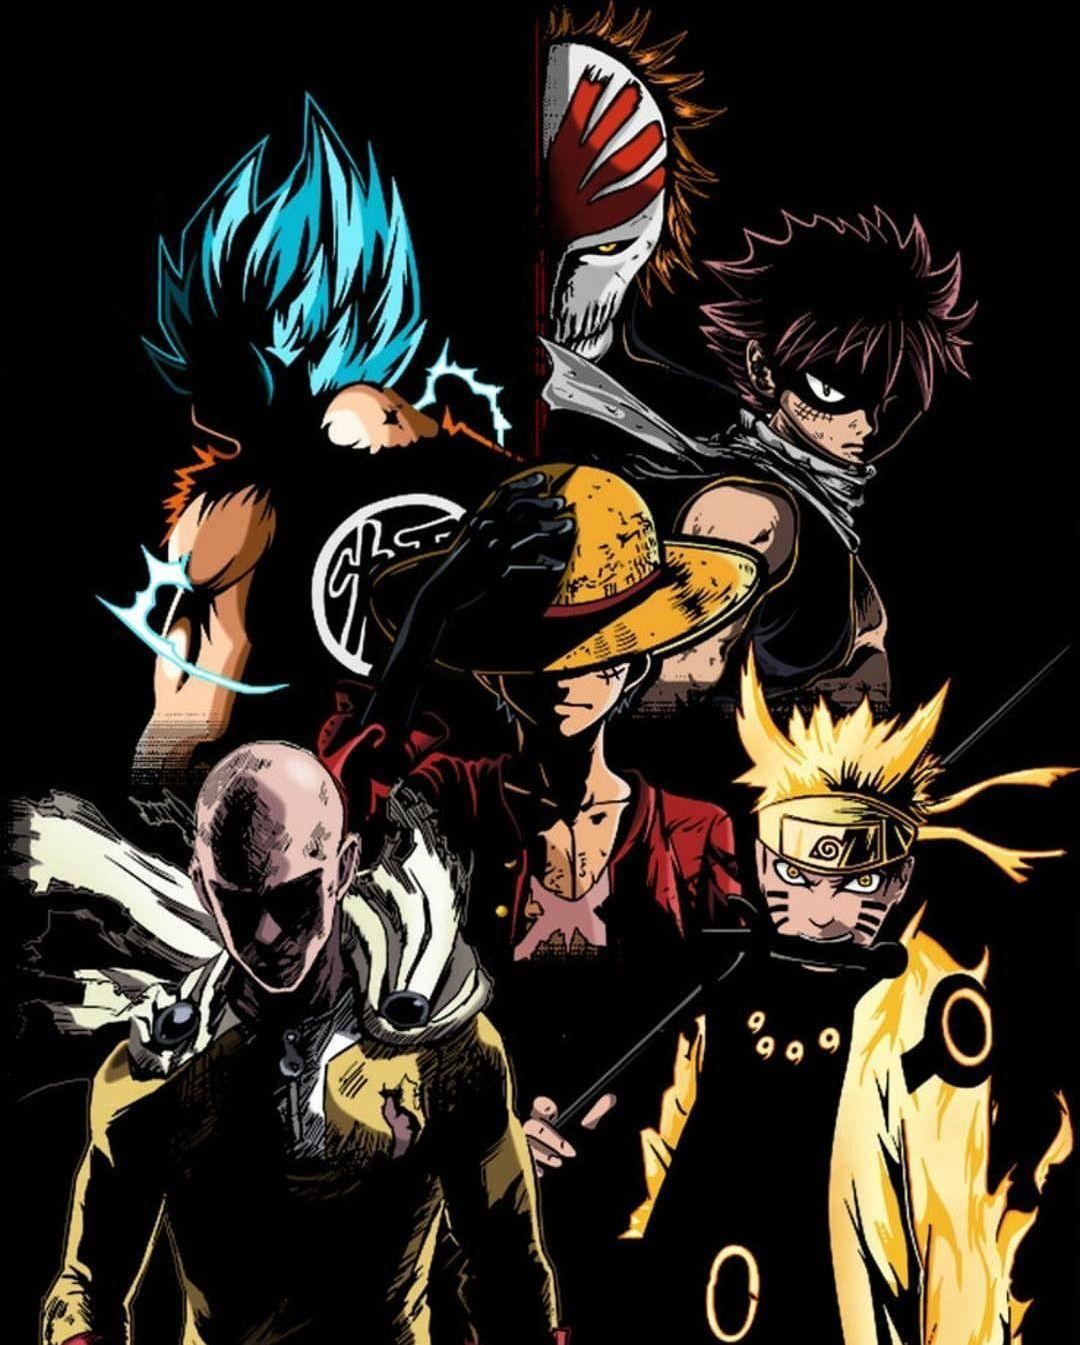 Warriors Manga Anime One Piece Anime Crossover Bleach Anime